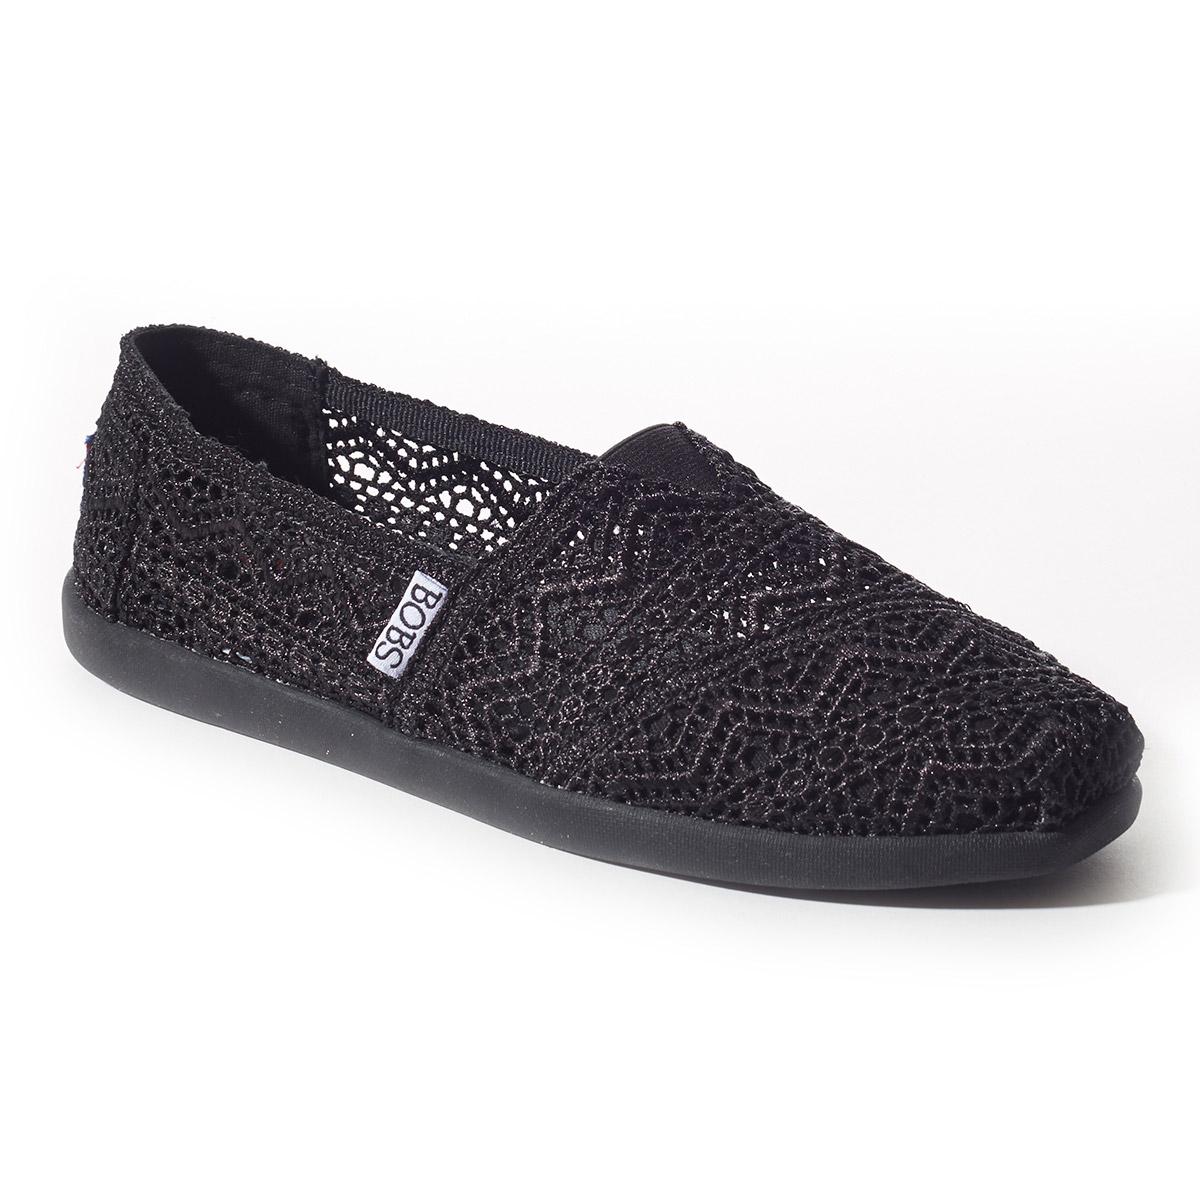 BOBS World Zig Zag Crochet Shoes